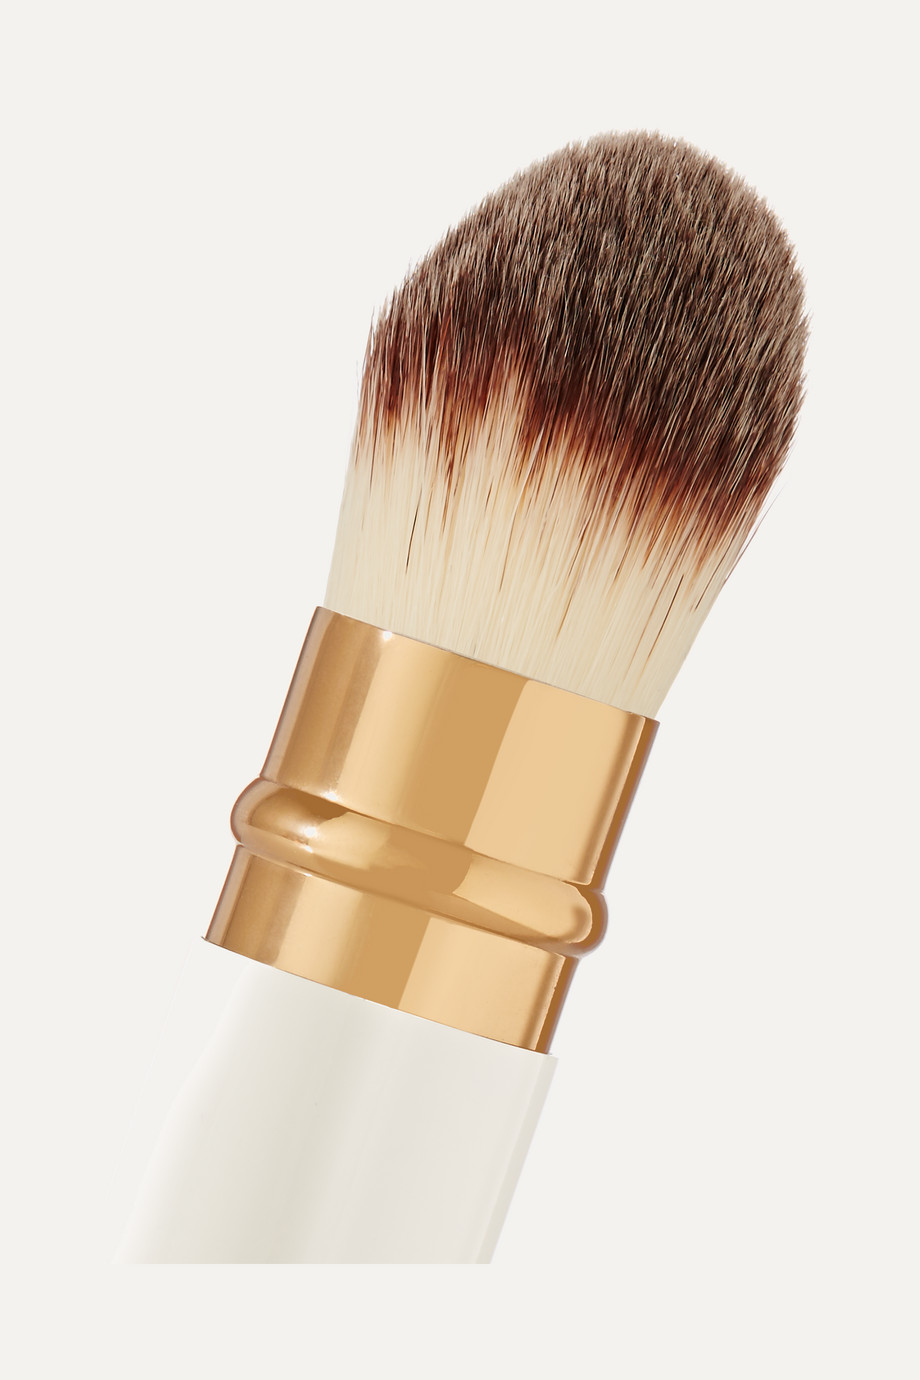 Lilah B. Retractable Foundation Brush – Pinsel